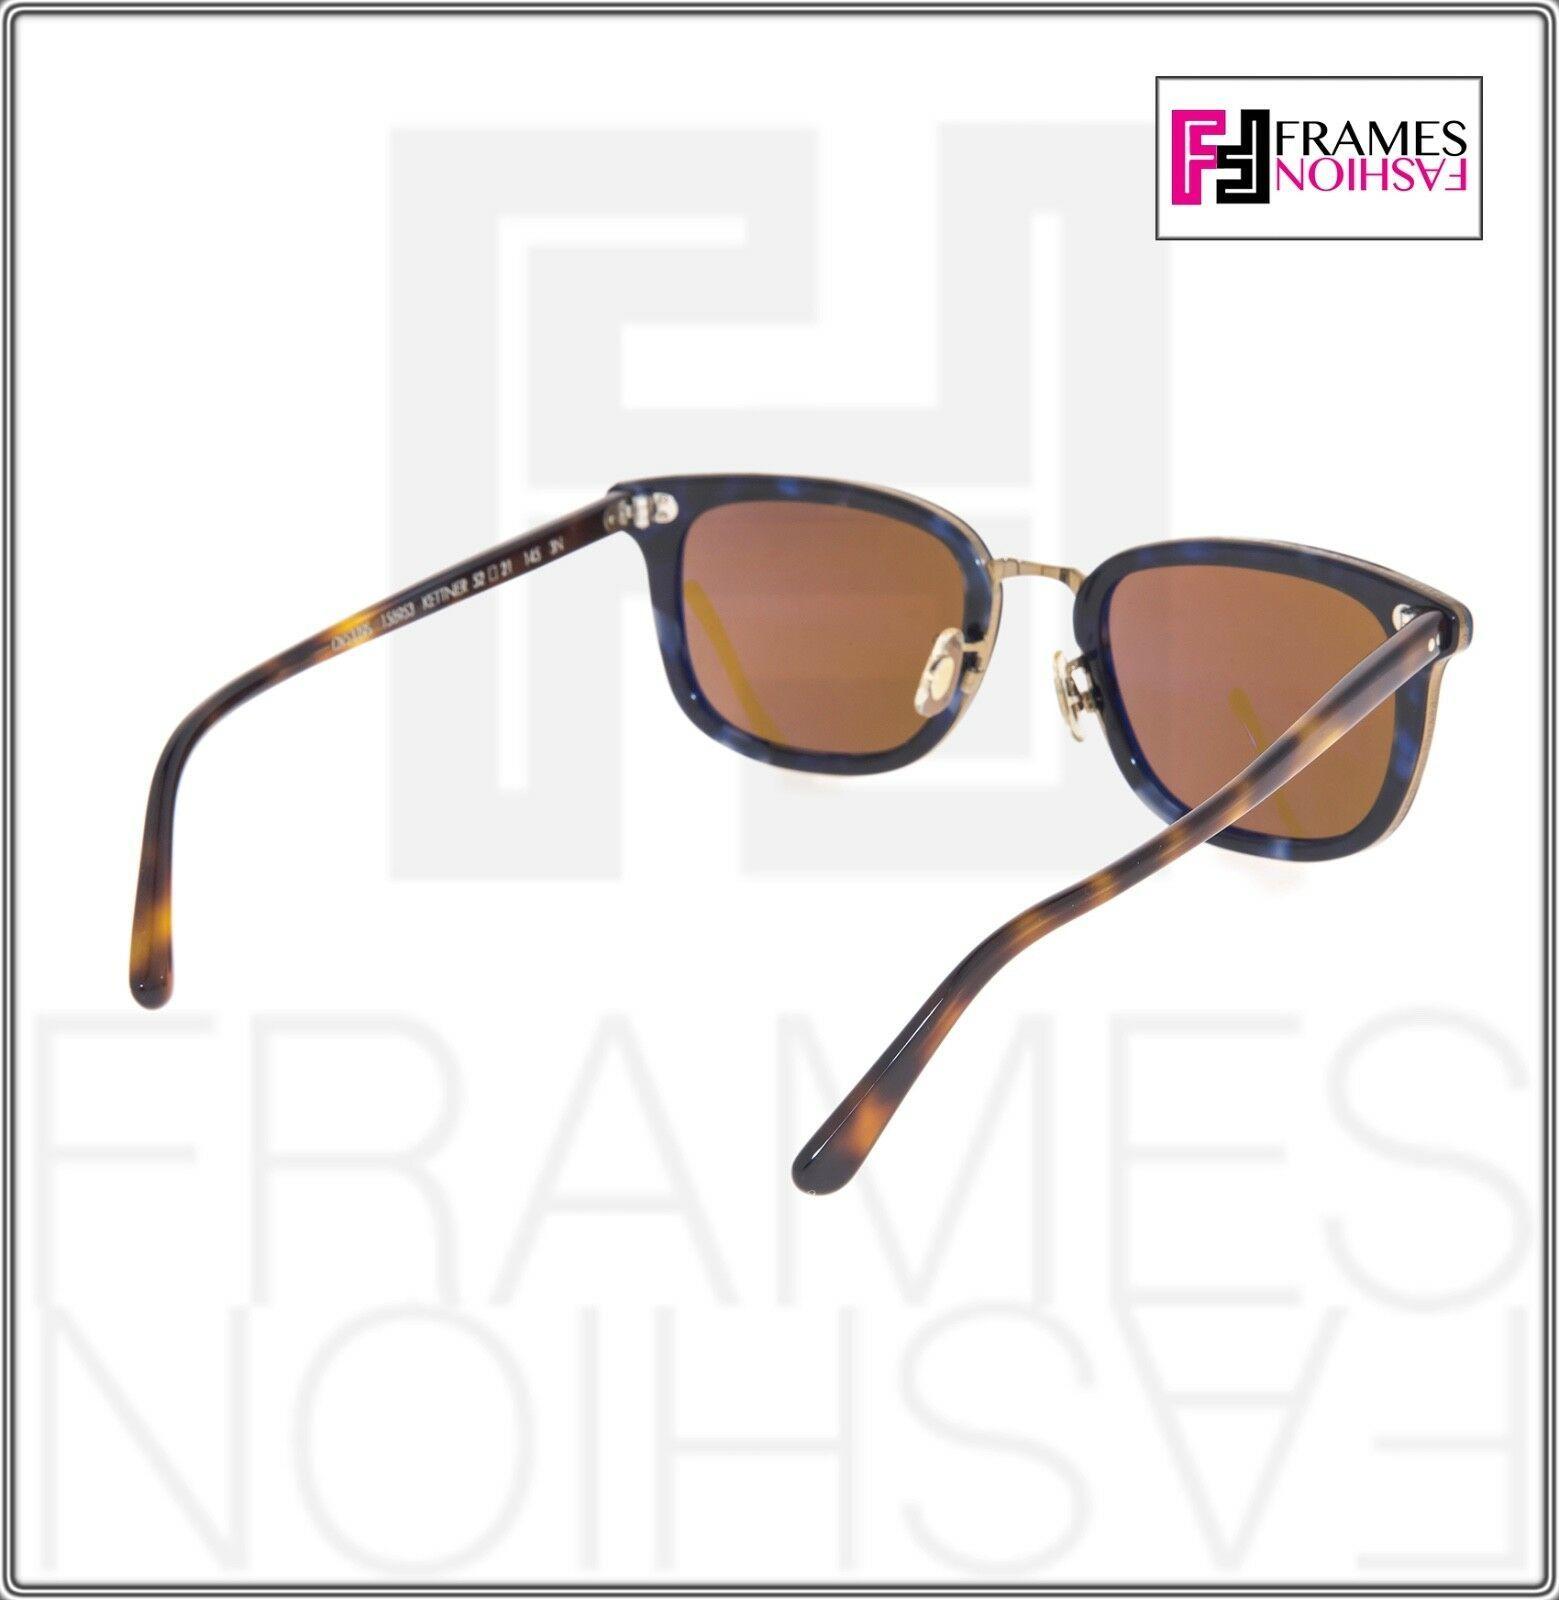 OLIVER PEOPLES KETTNER OV5339S Brown Blue Tortoise Cosmik Sunglasses 5339 image 4